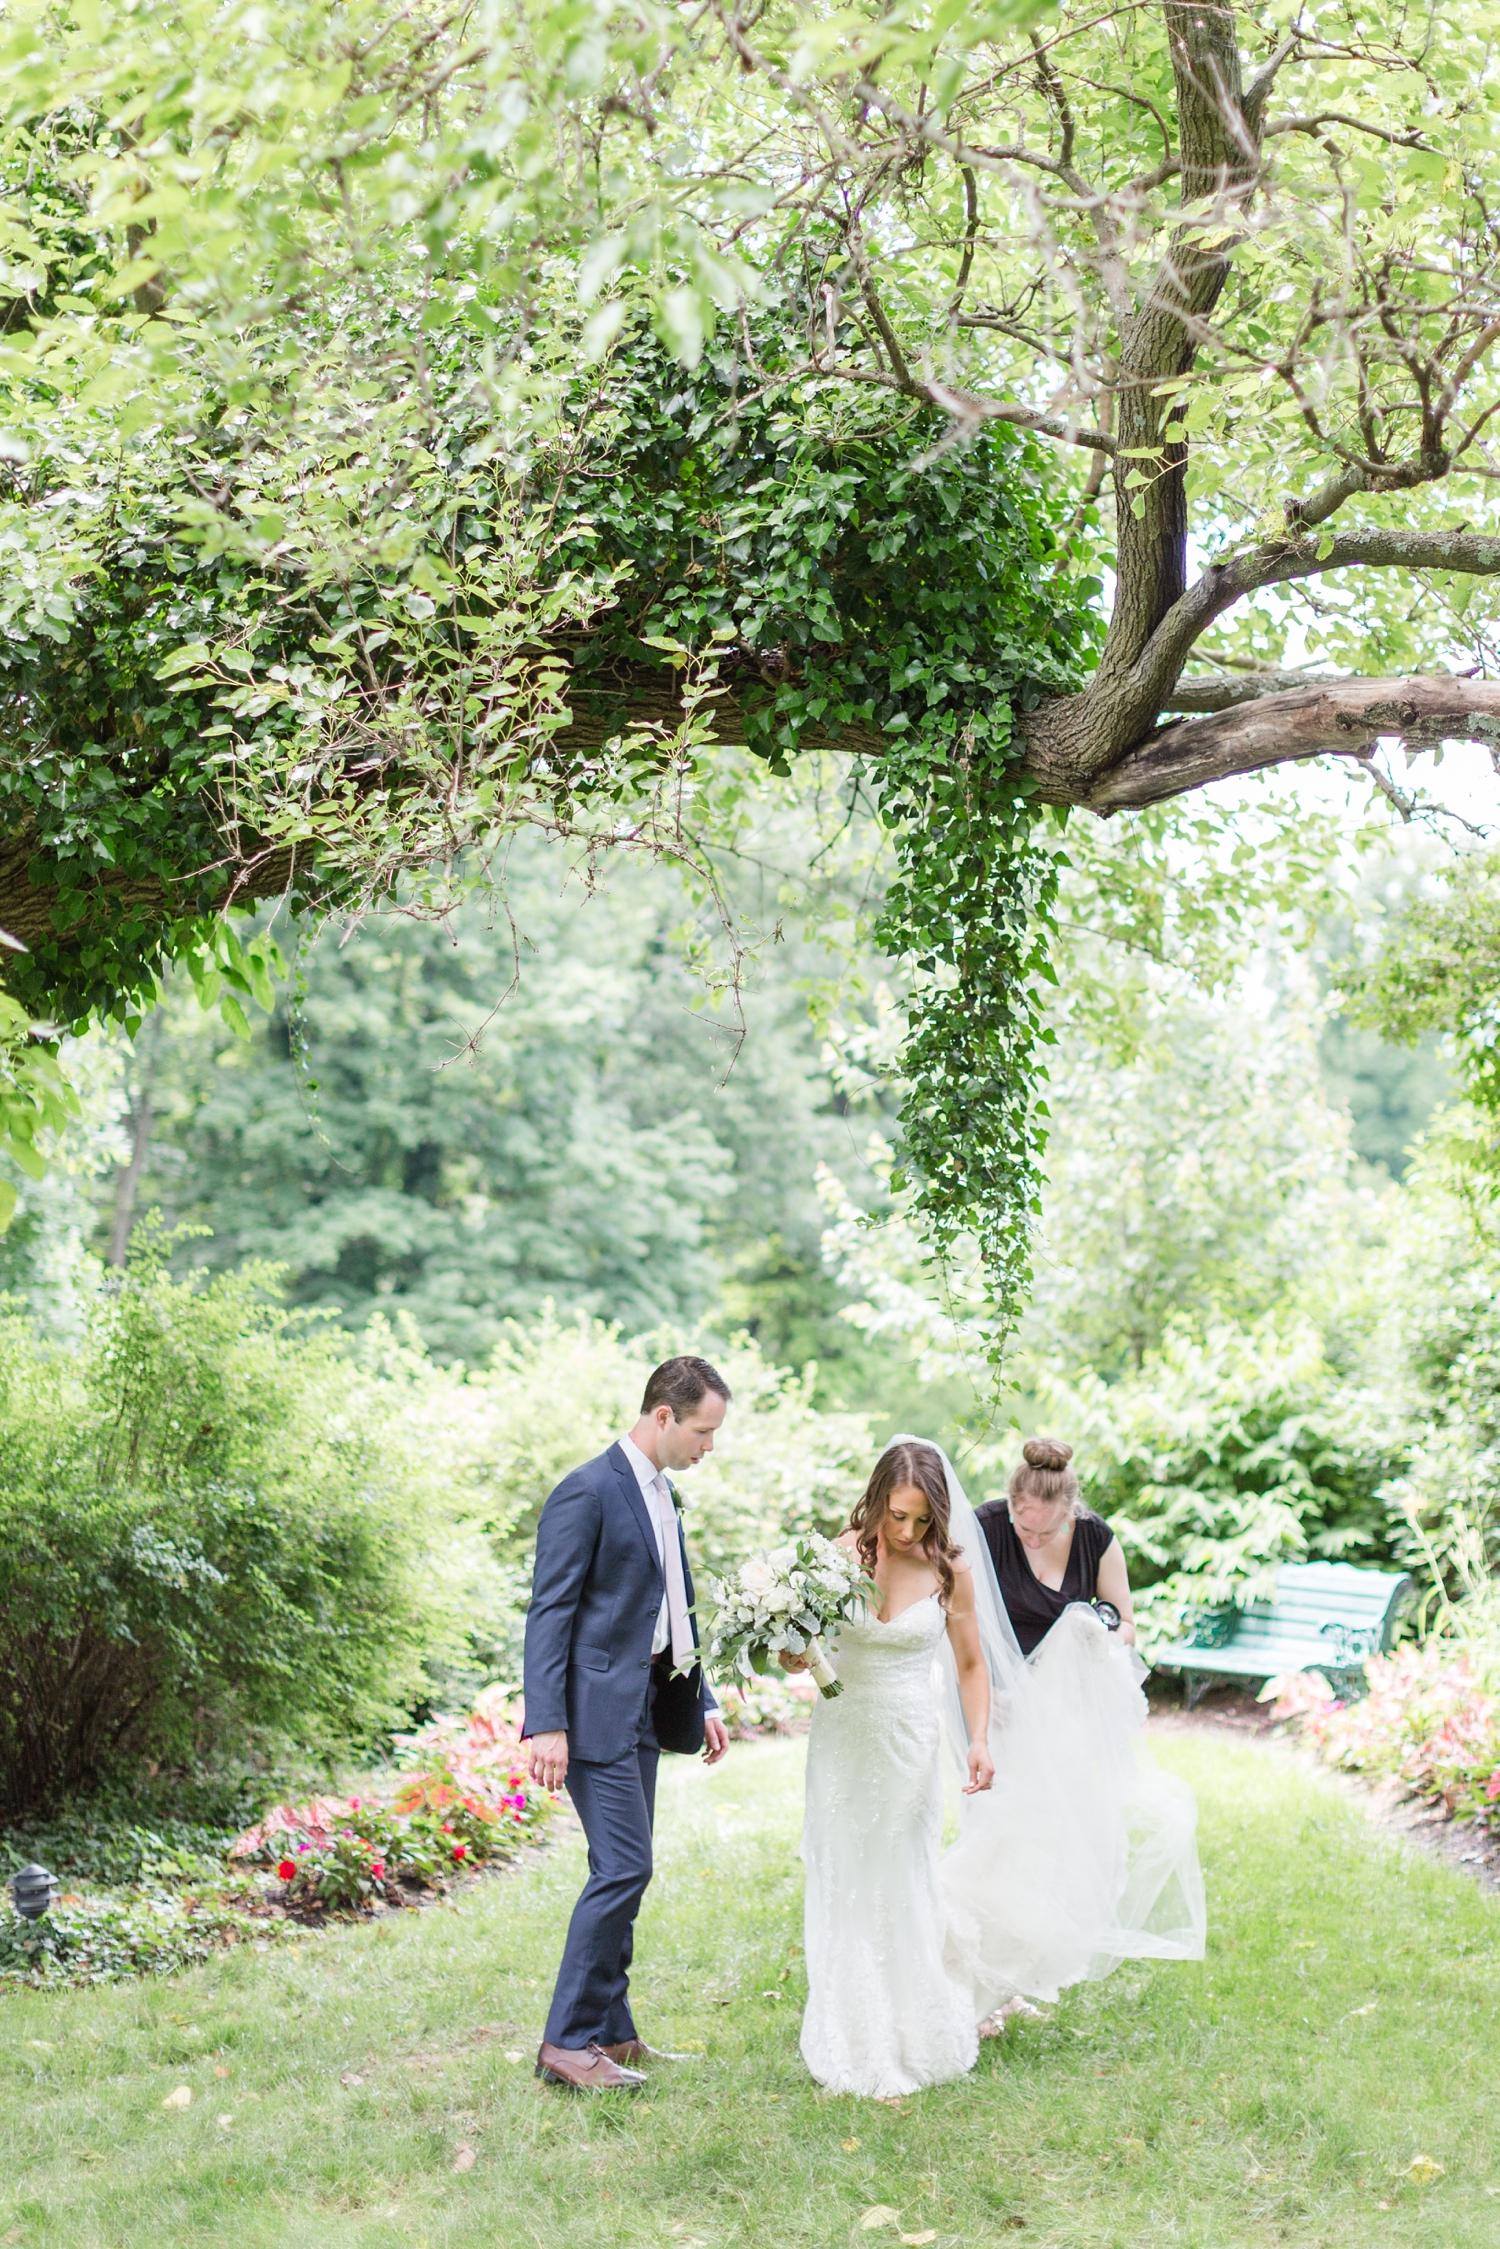 Malat Wedding 3-Bride & Groom Portraits-254_Maryland-Virginia-Wedding-Photographer-Behind-The-Scenes-anna-grace-photography-photo.jpg